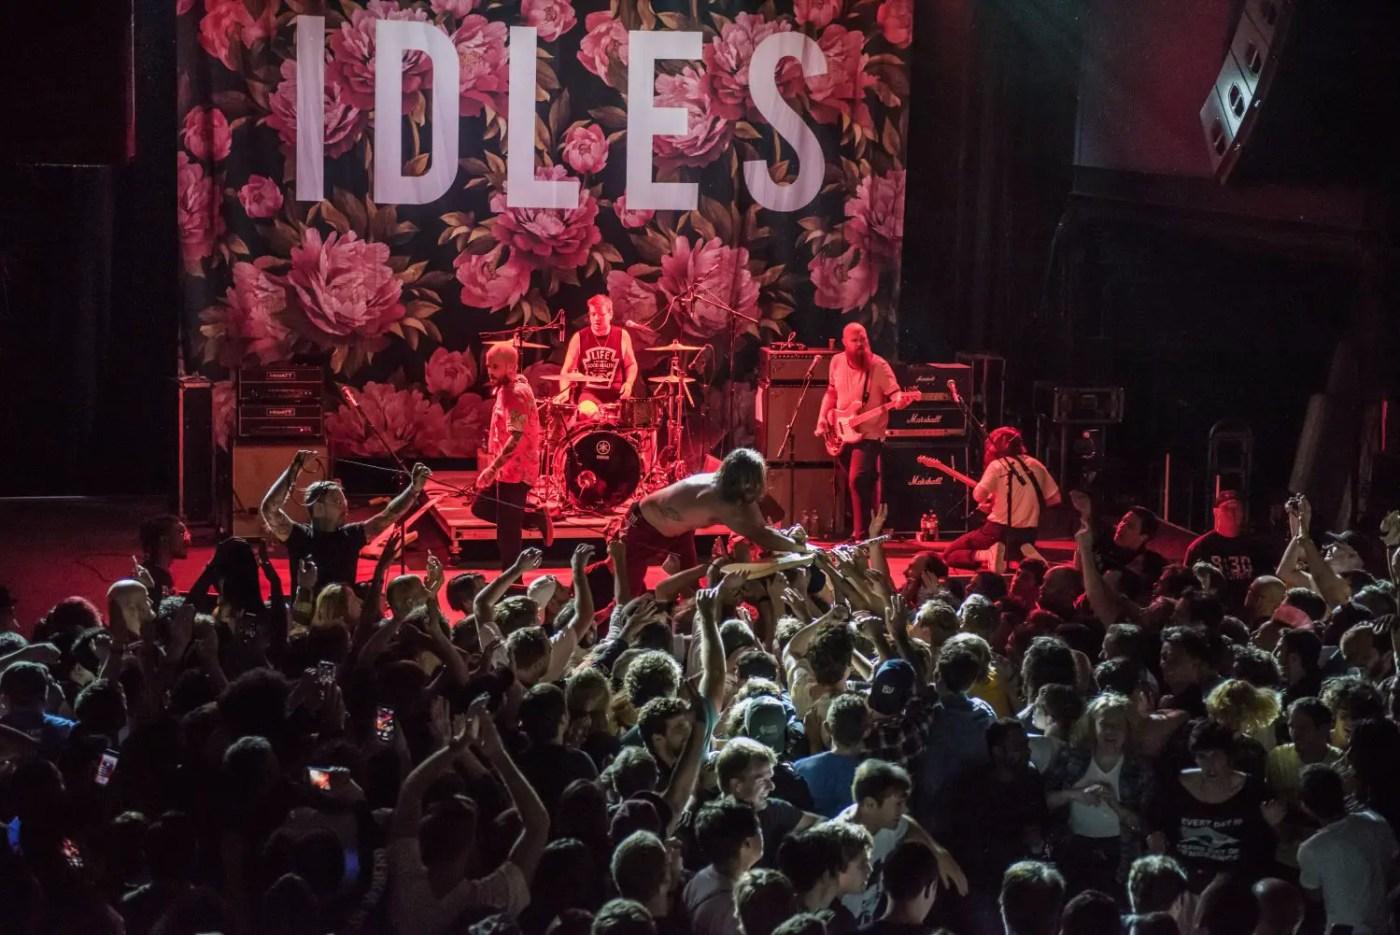 IDLES : 9:30 Club | Photos | LIVING LIFE FEARLESS